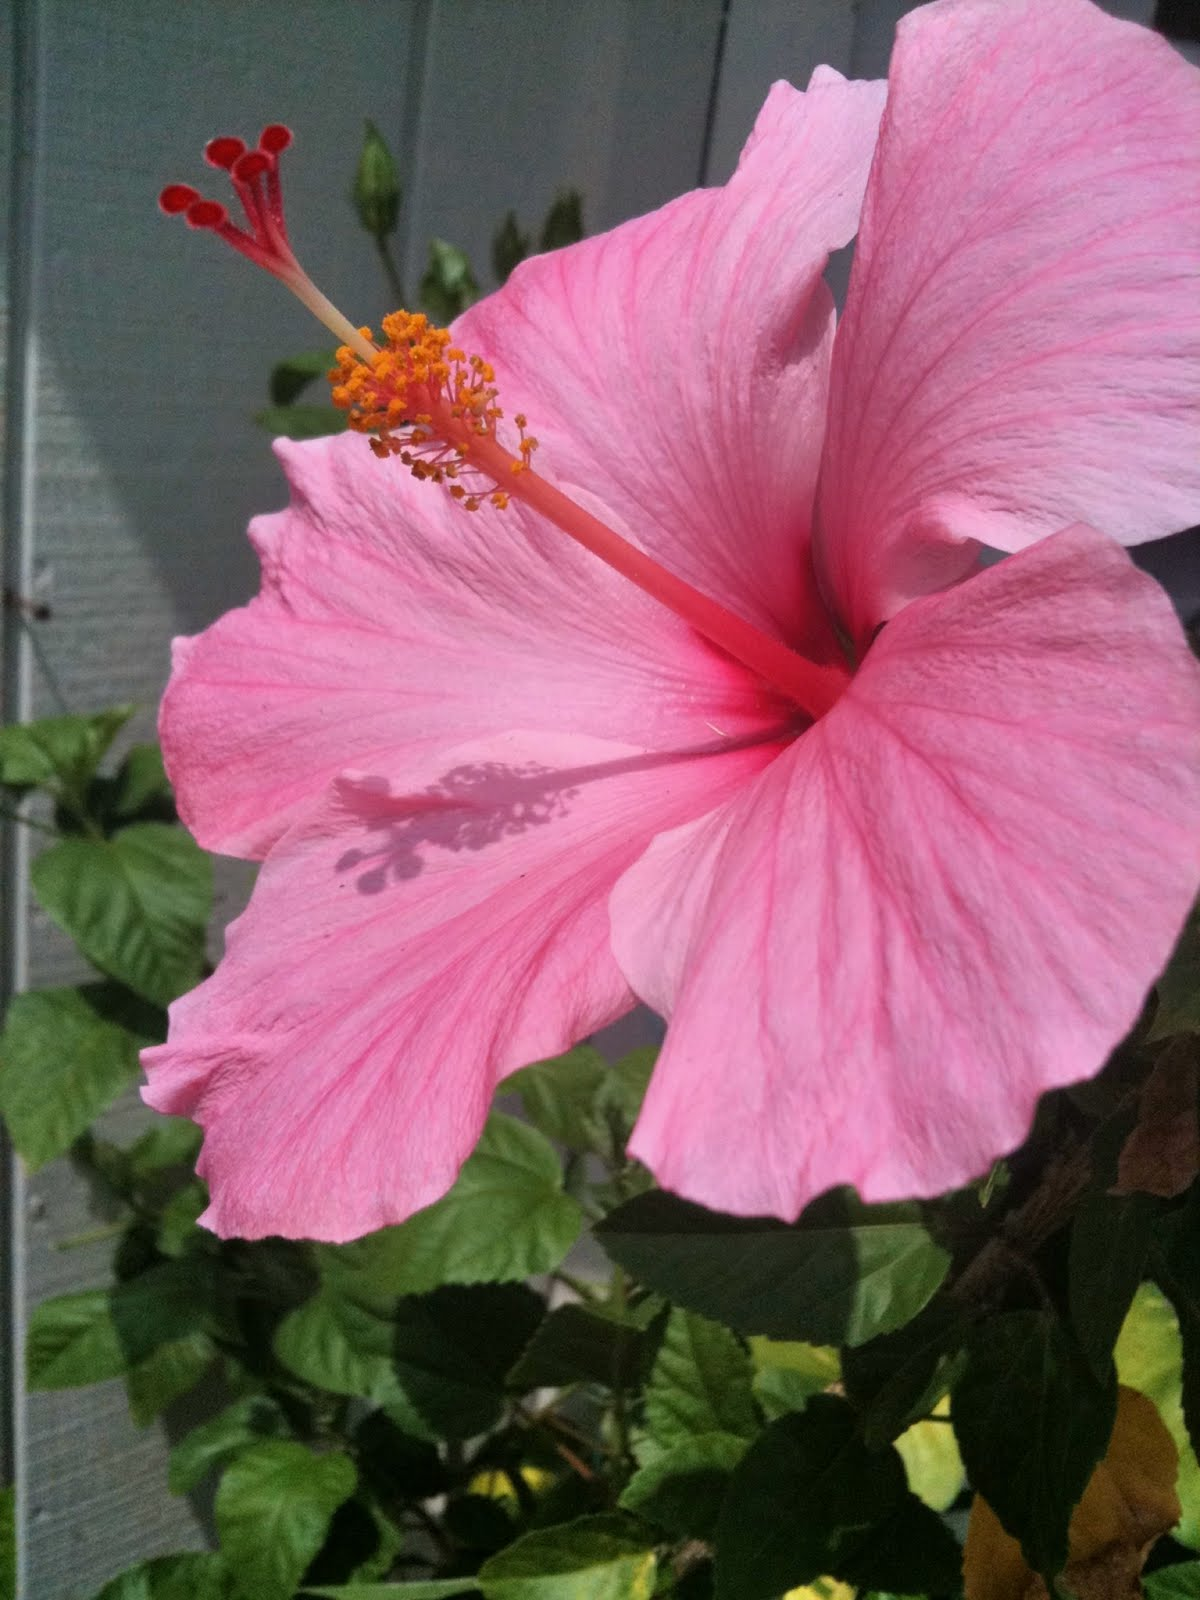 http://2.bp.blogspot.com/_LaakhfpX99w/TD5uA-WevII/AAAAAAAABeA/UKE_TJiWLj4/s1600/Pink%2BHibiscus.jpg